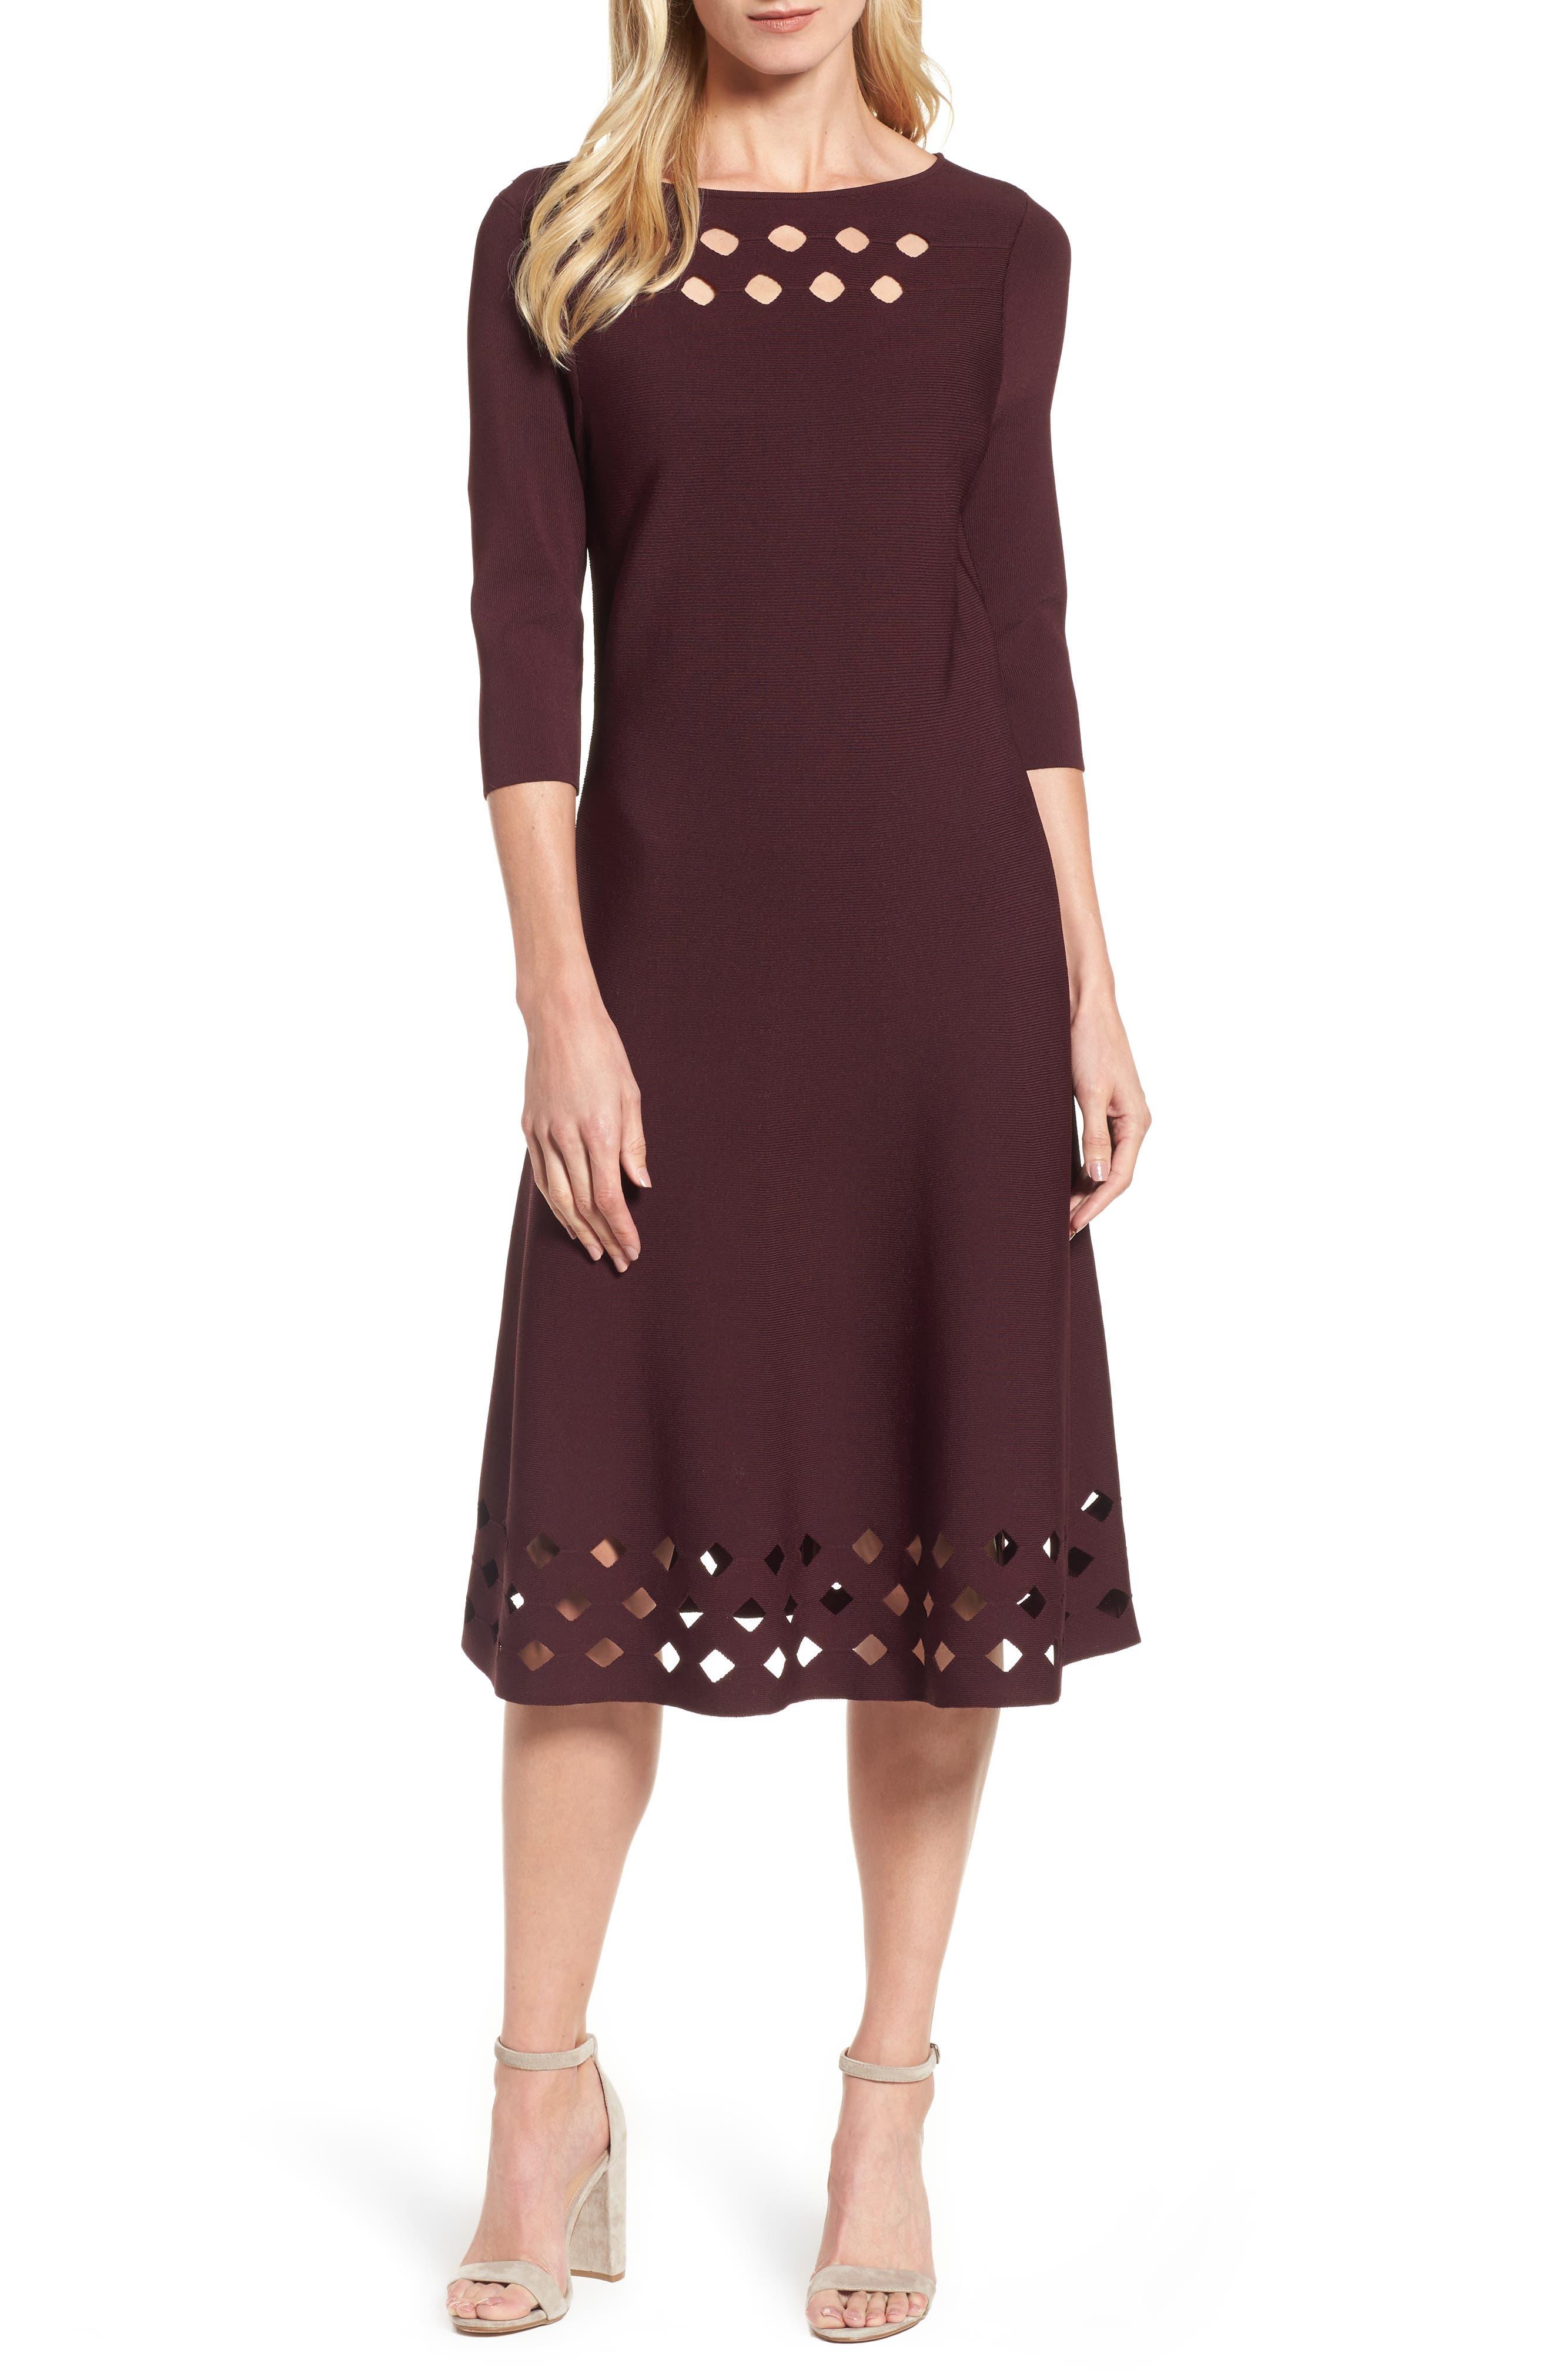 Alternate Image 1 Selected - NIC+ZOE Time Out Twirl Midi Dress (Regular & Petite)